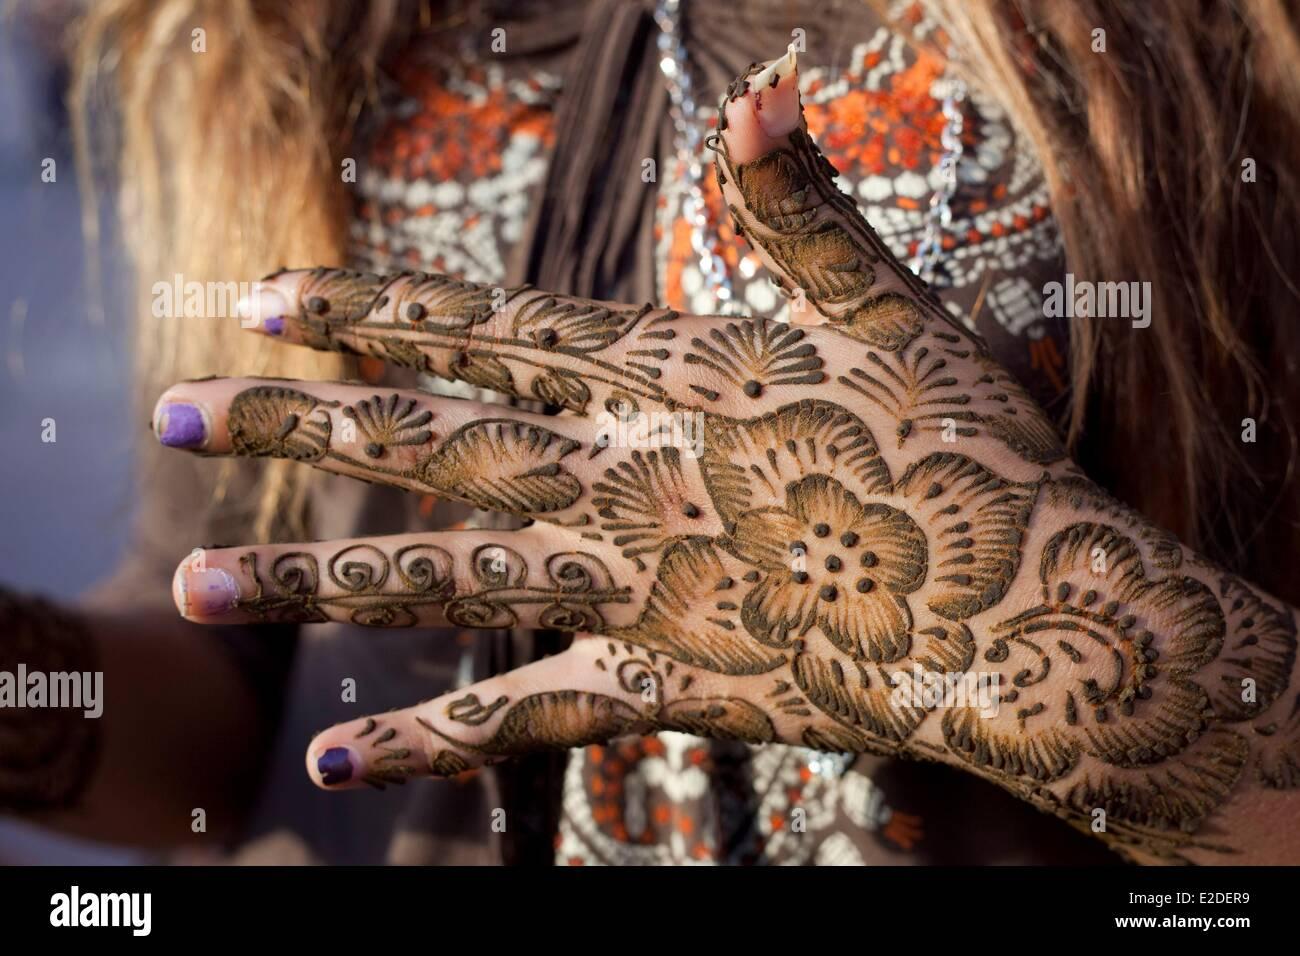 Morocco, Rabat, hand tattoo with henna - Stock Image